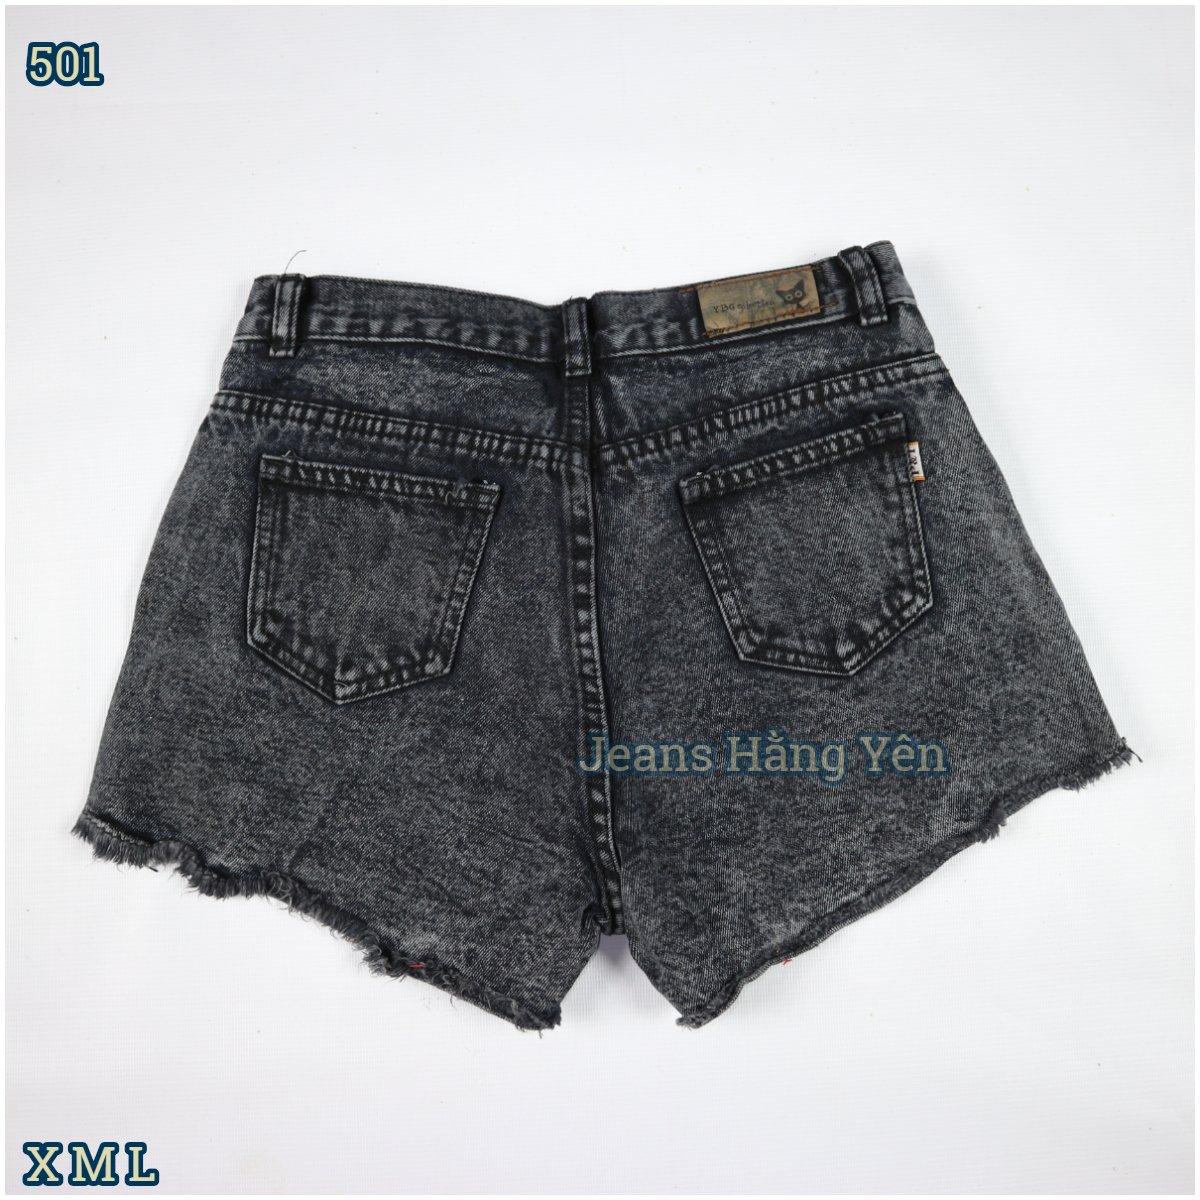 Quần Short Jean Nữ Cotton Kiểu Trơn Tua Lai Màu Xám ms 501